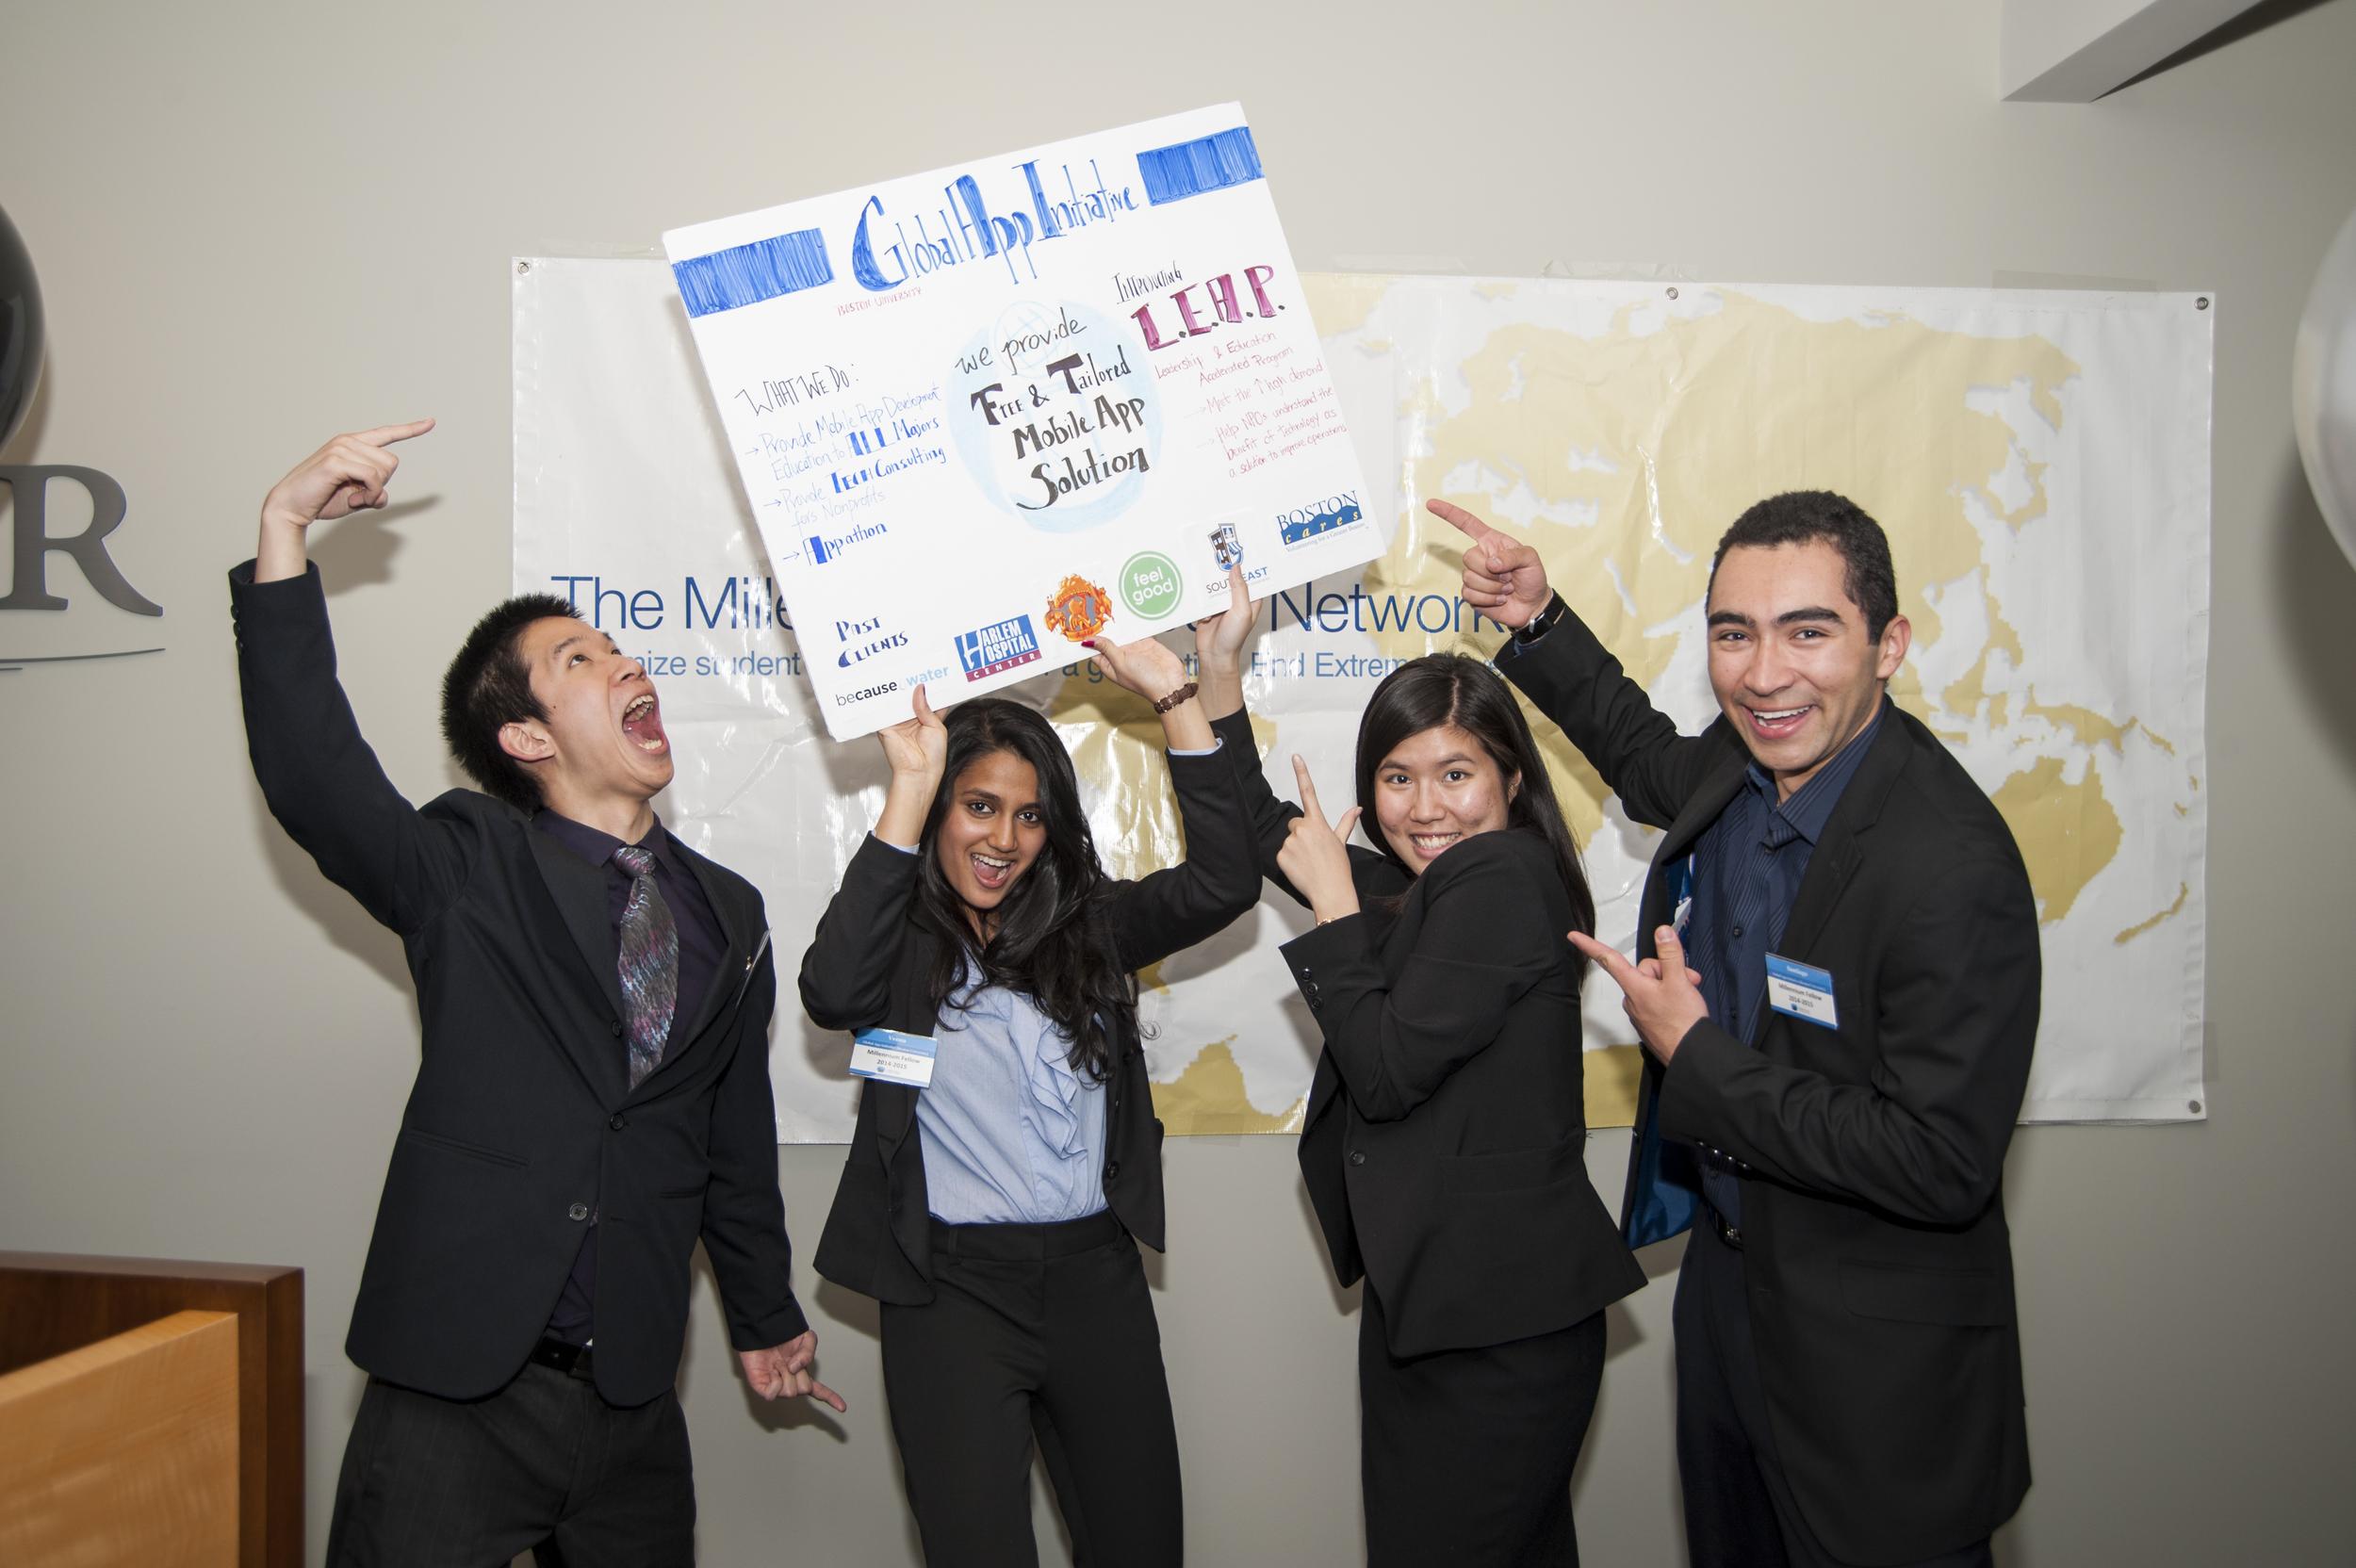 Fellowship organization Global App Initiative  celebrates a successyear of hard work!